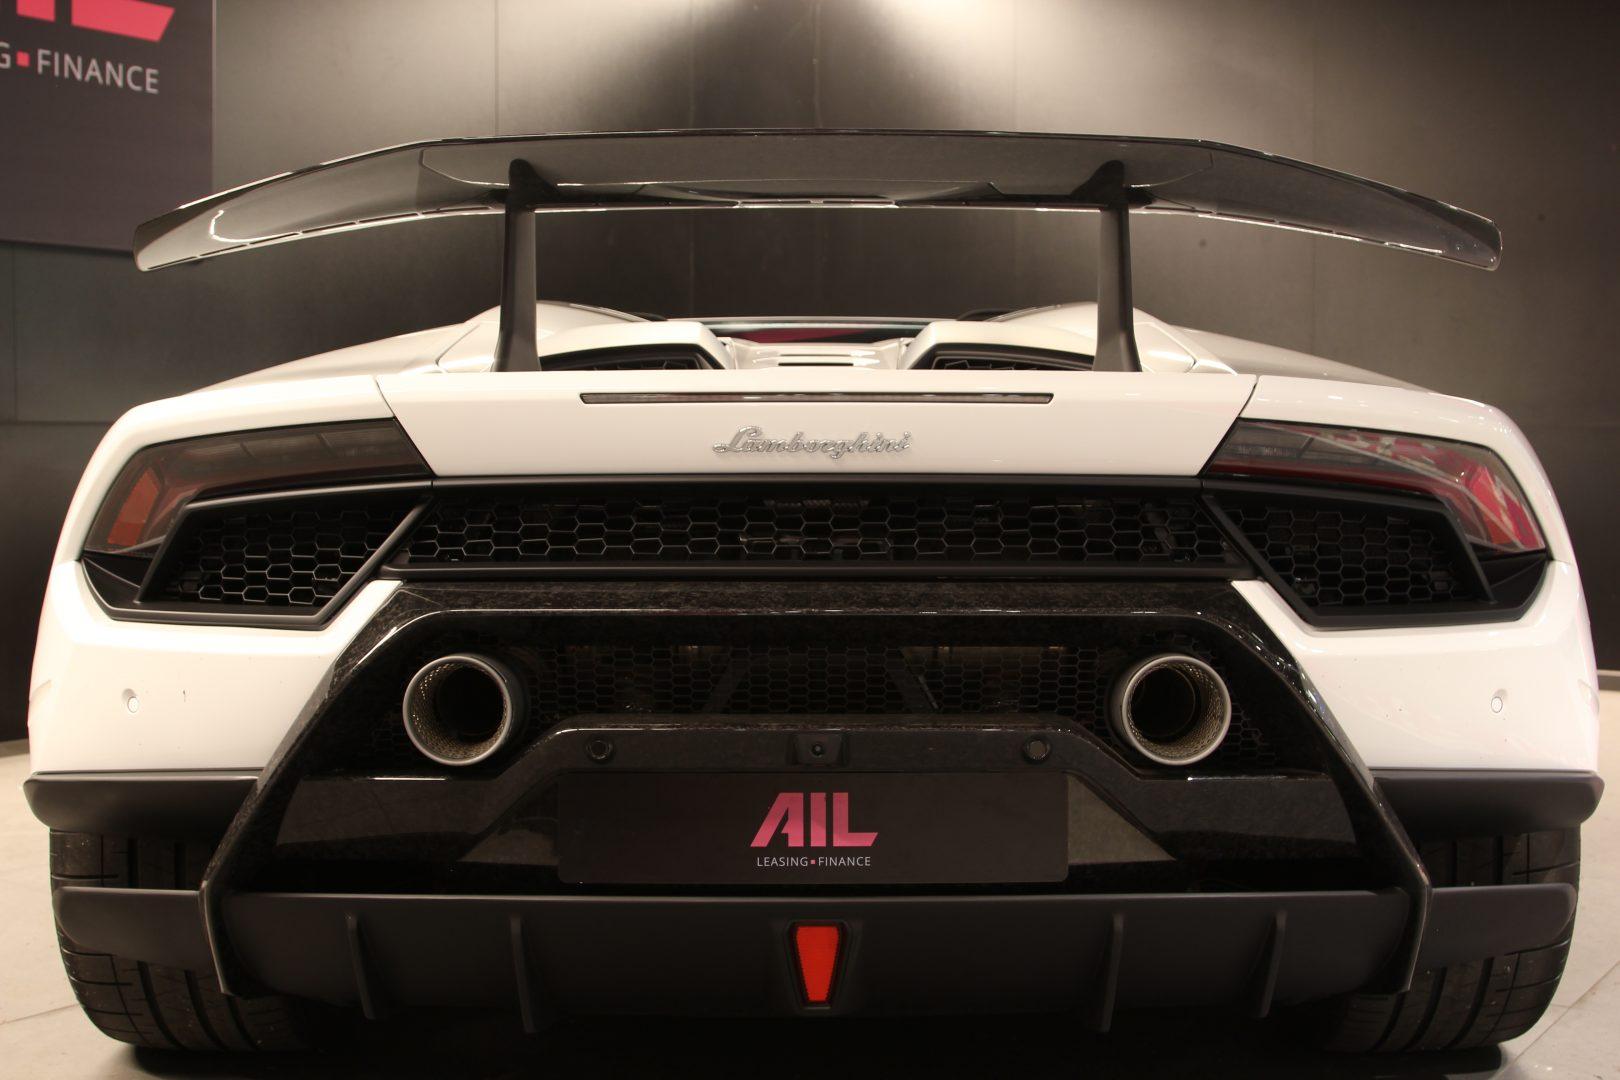 AIL Lamborghini Huracan Performante Spyder LP 640-4 4